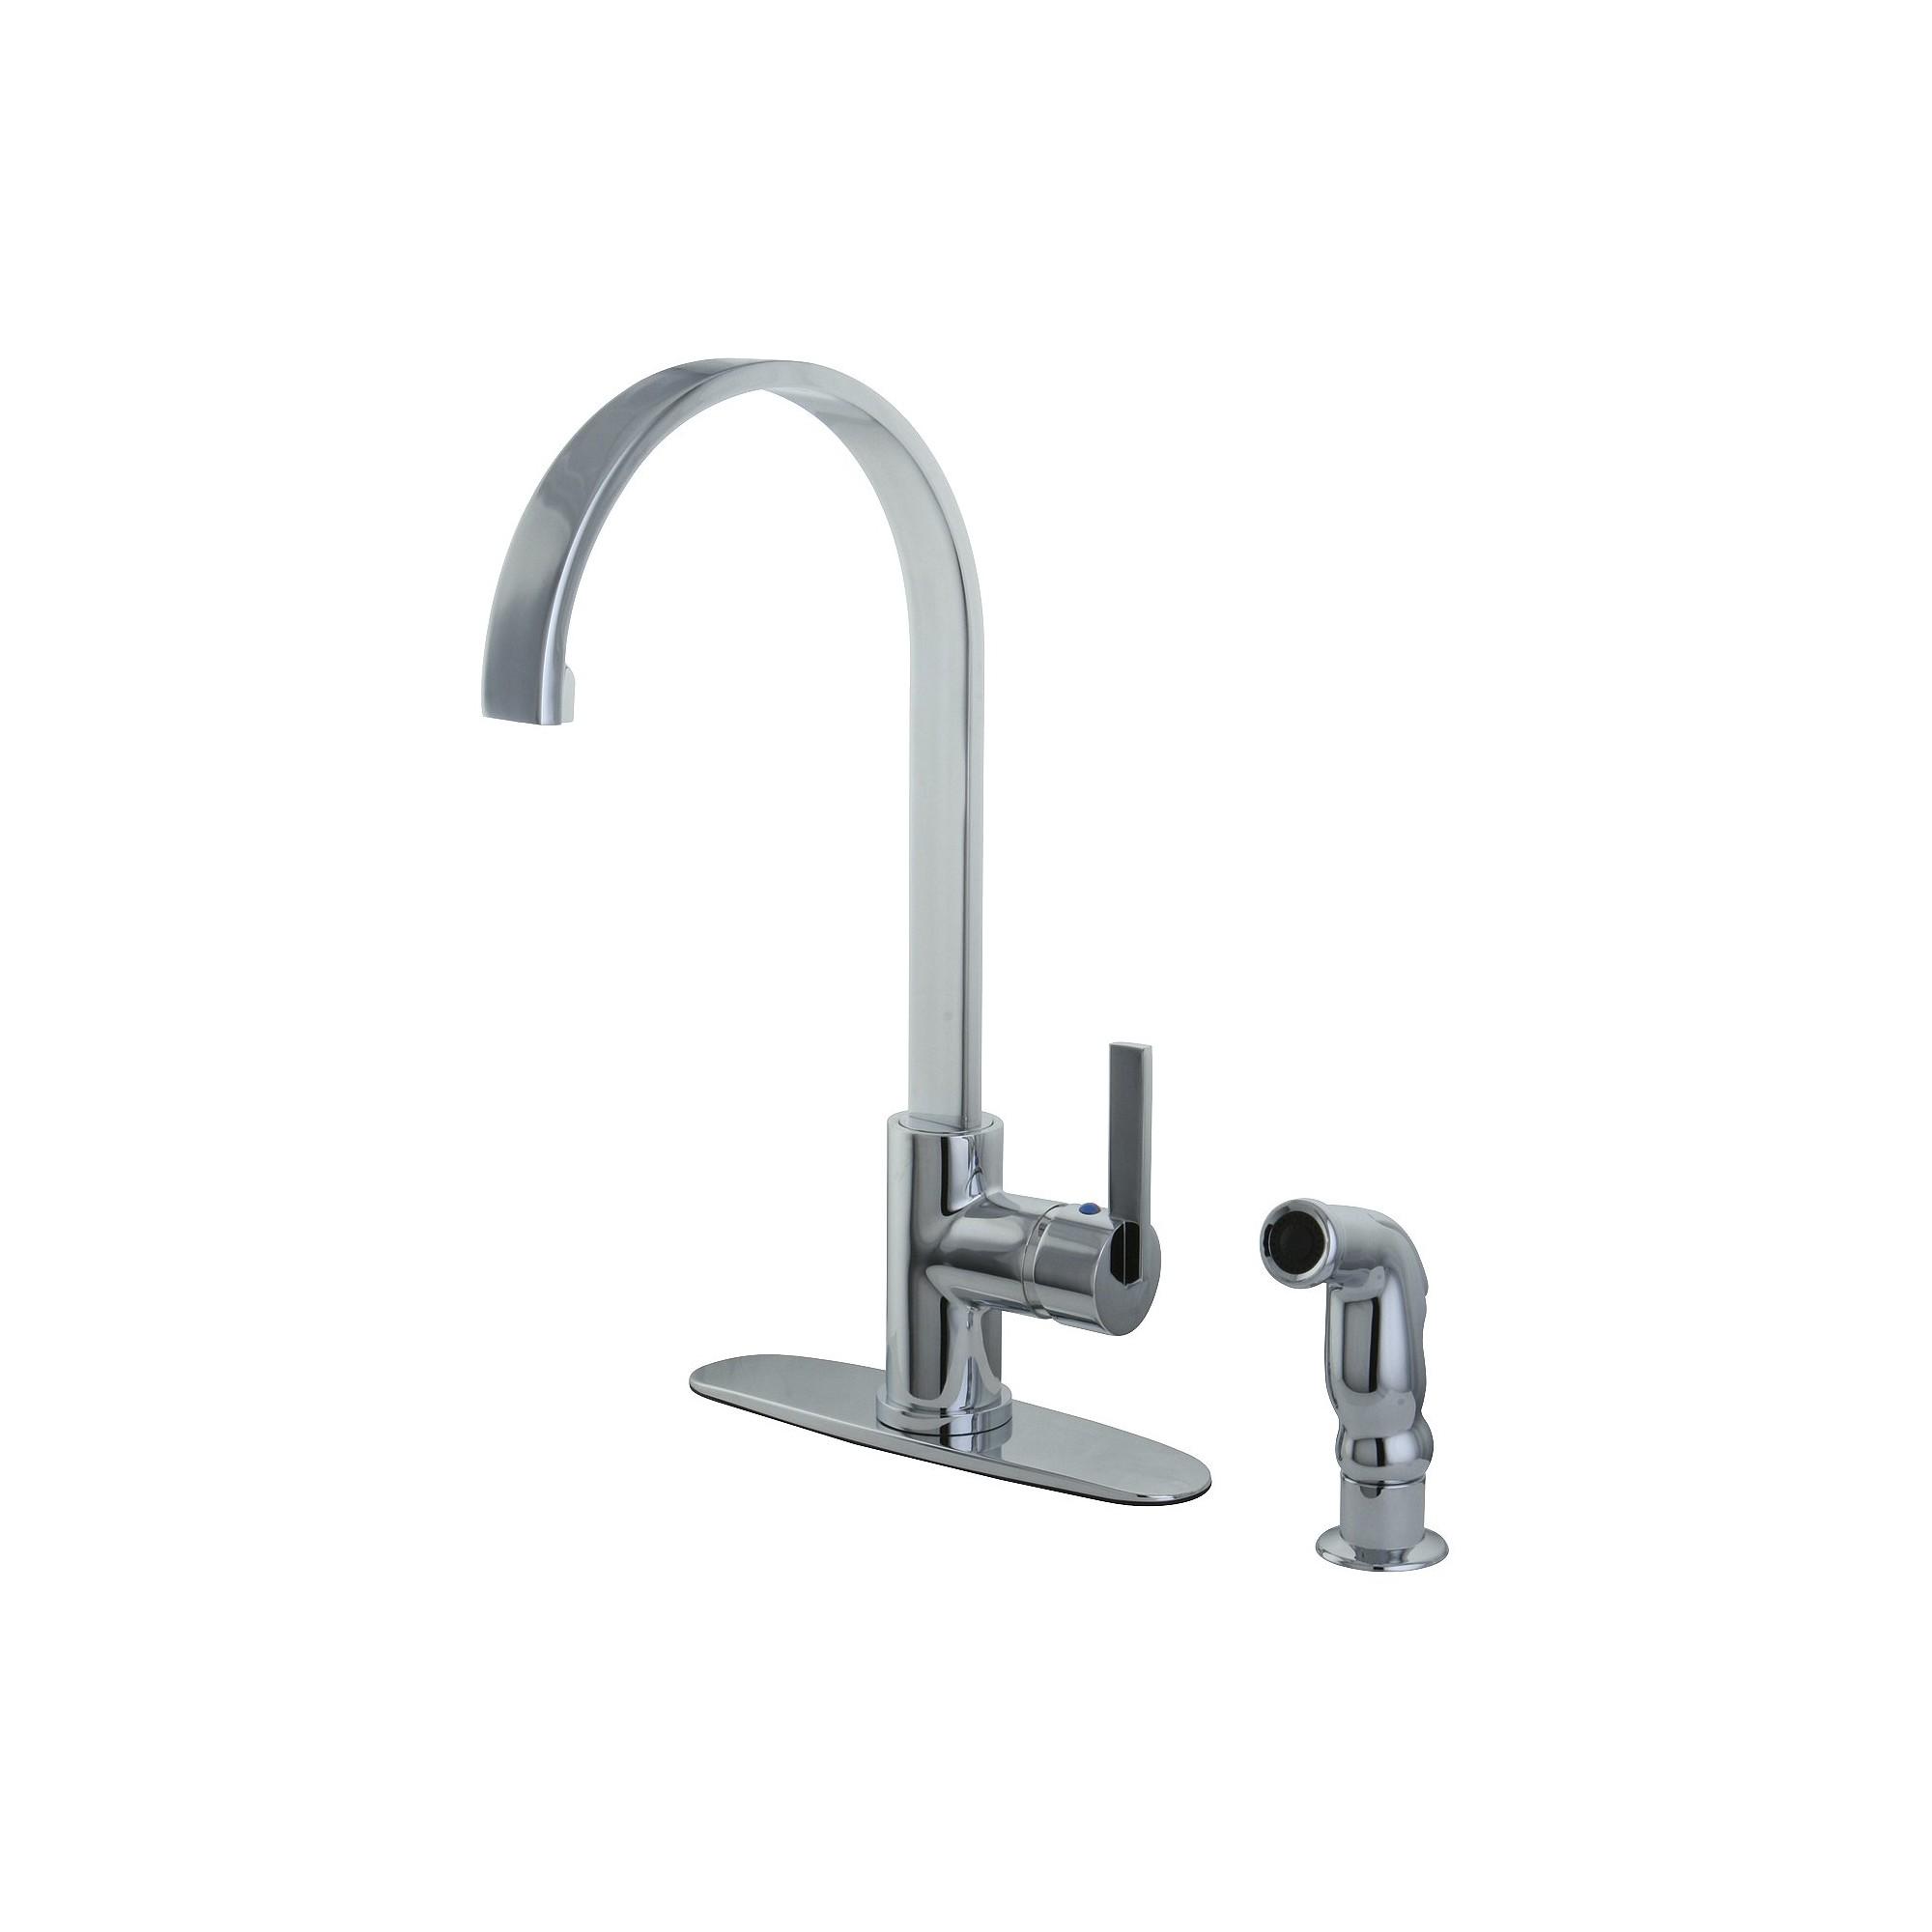 Modern Single Lever Kitchen Faucet Chrome - Kingston Brass, Chorme